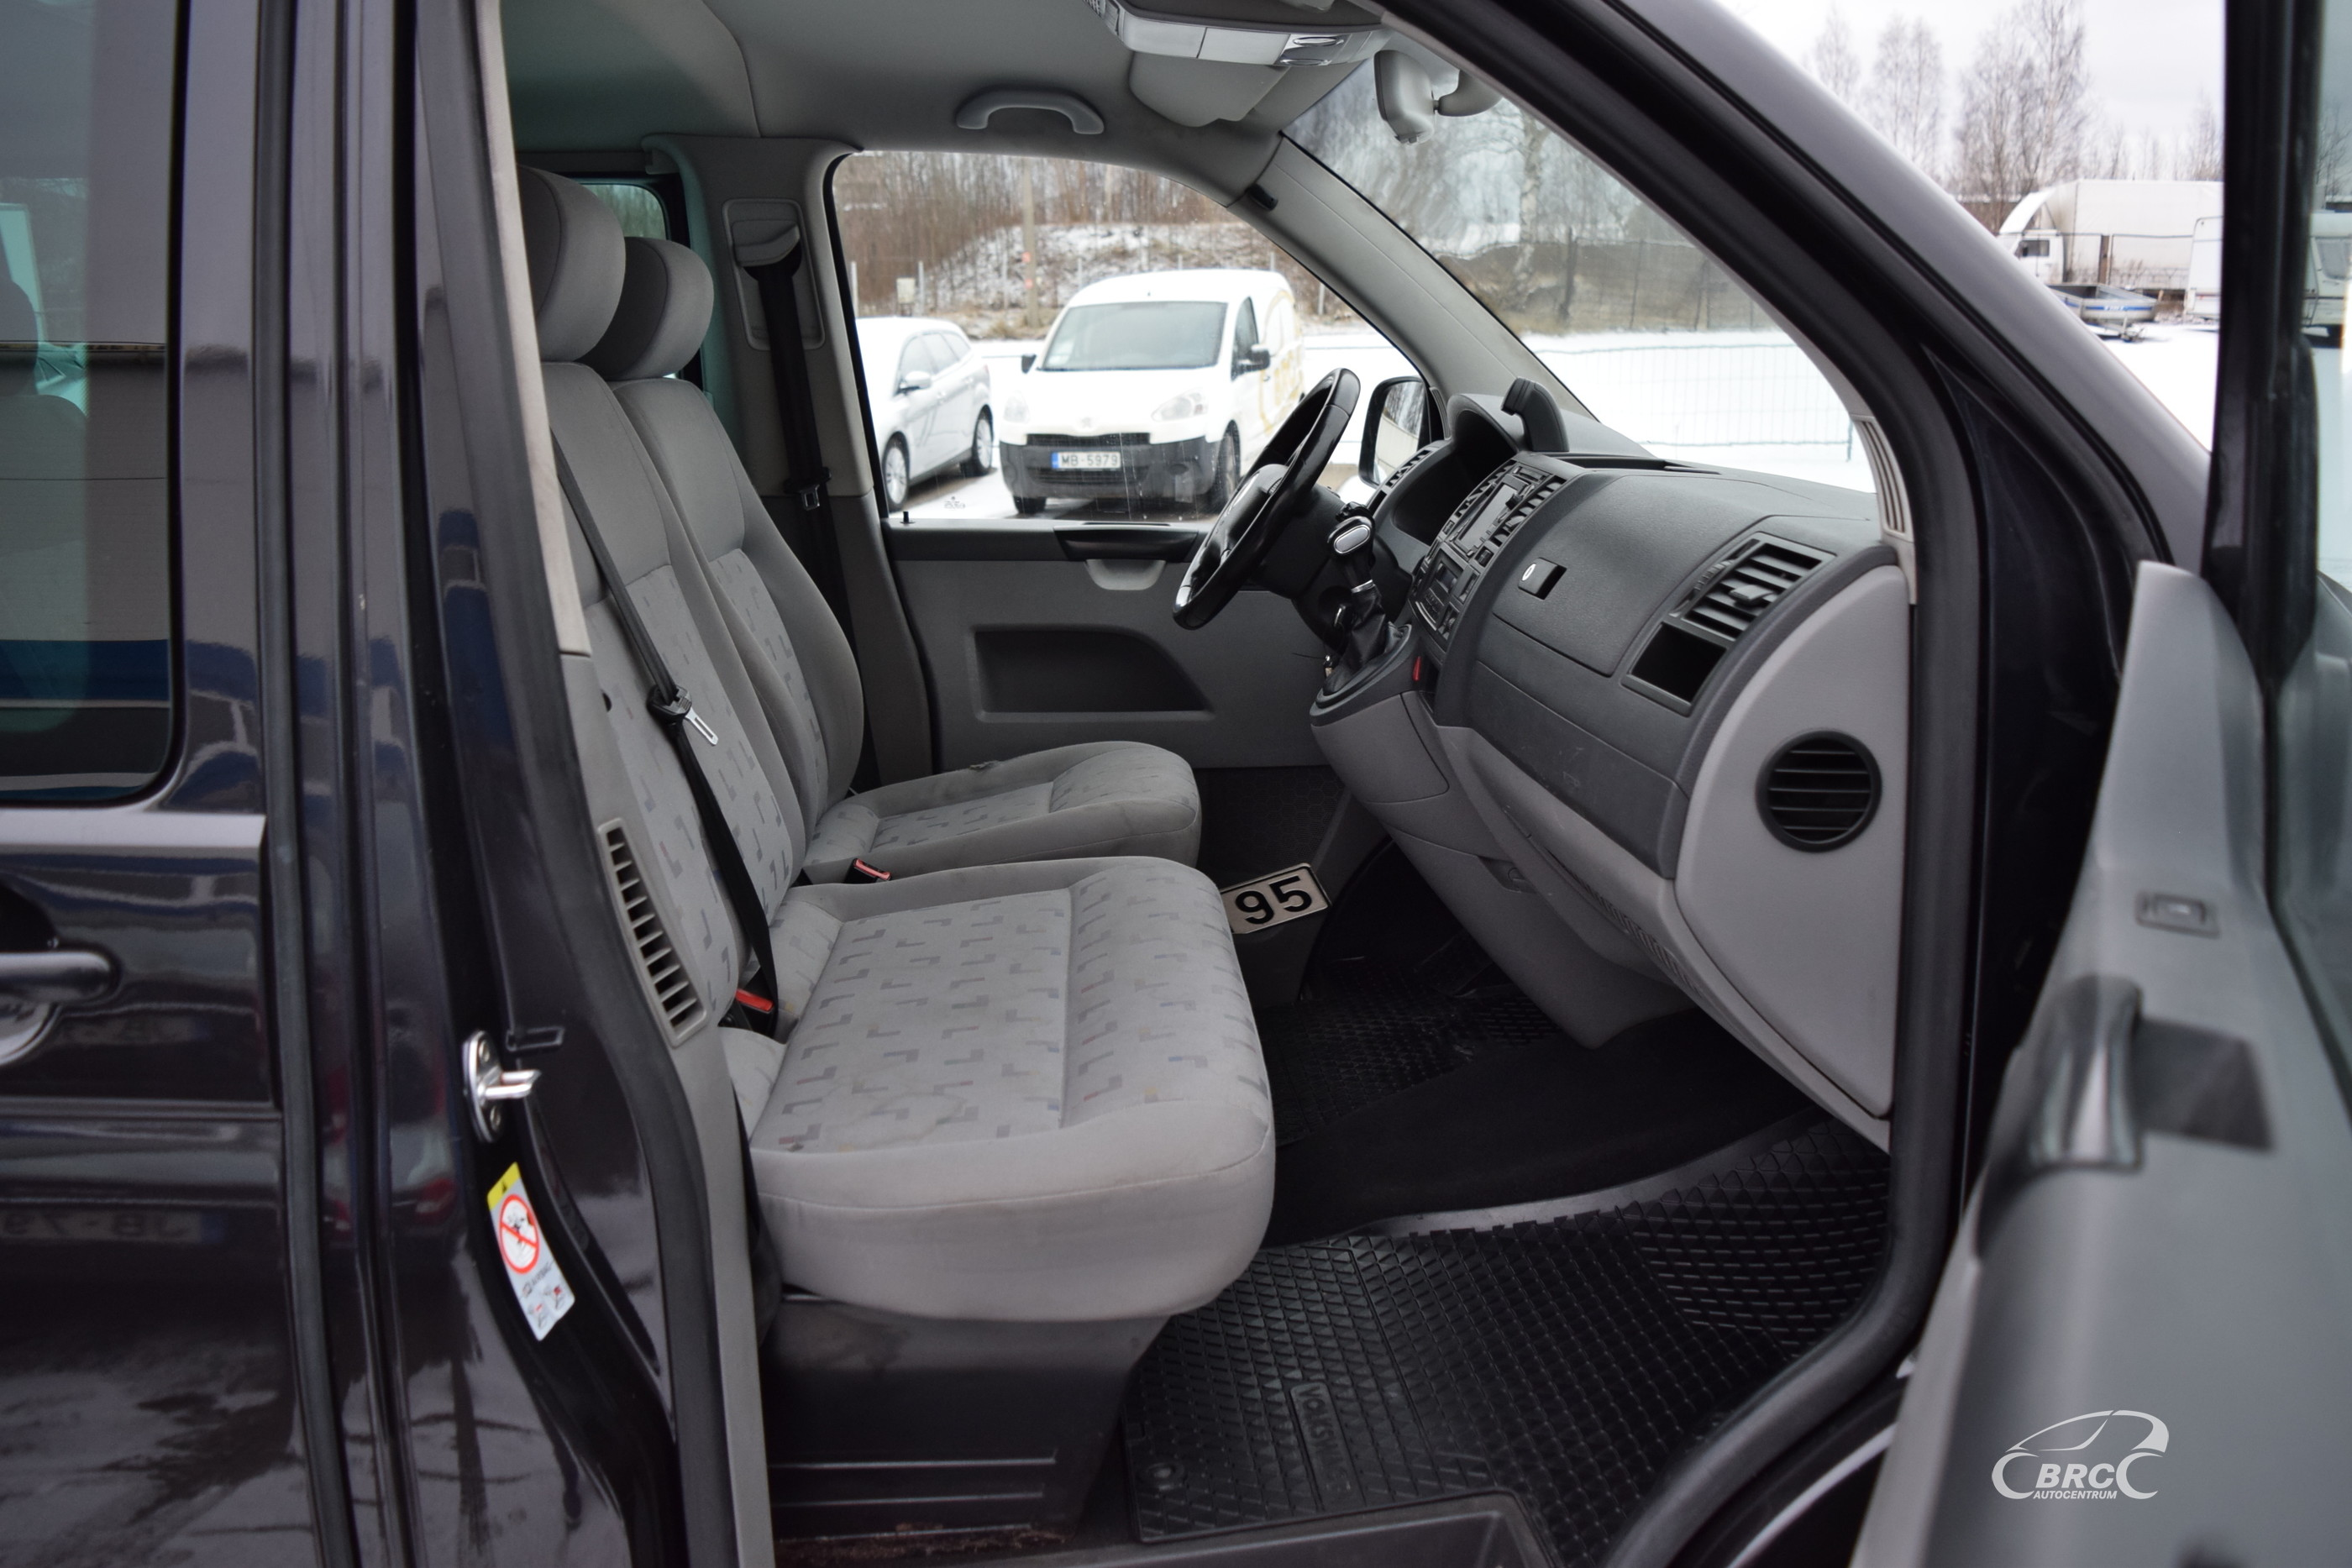 Volkswagen Caravelle TDi A/T 9 seats